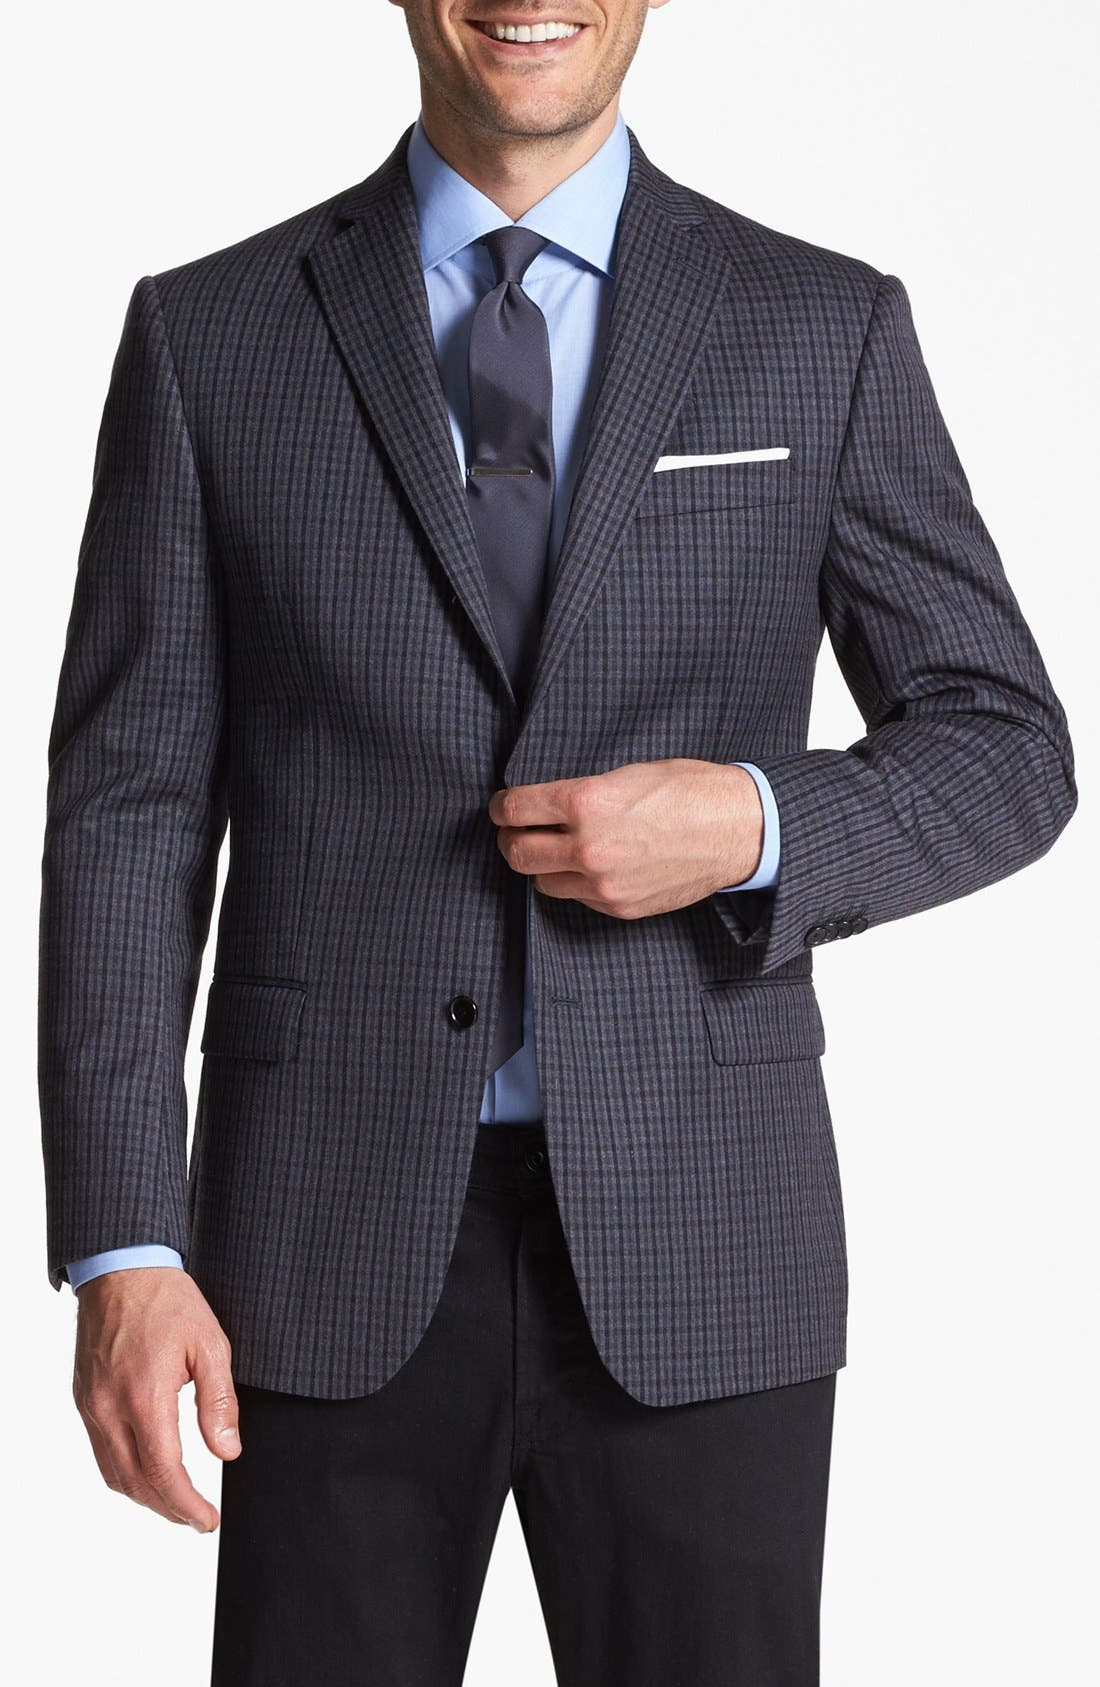 Alternate Image 1 Selected - Michael Kors Trim Fit Plaid Sportcoat